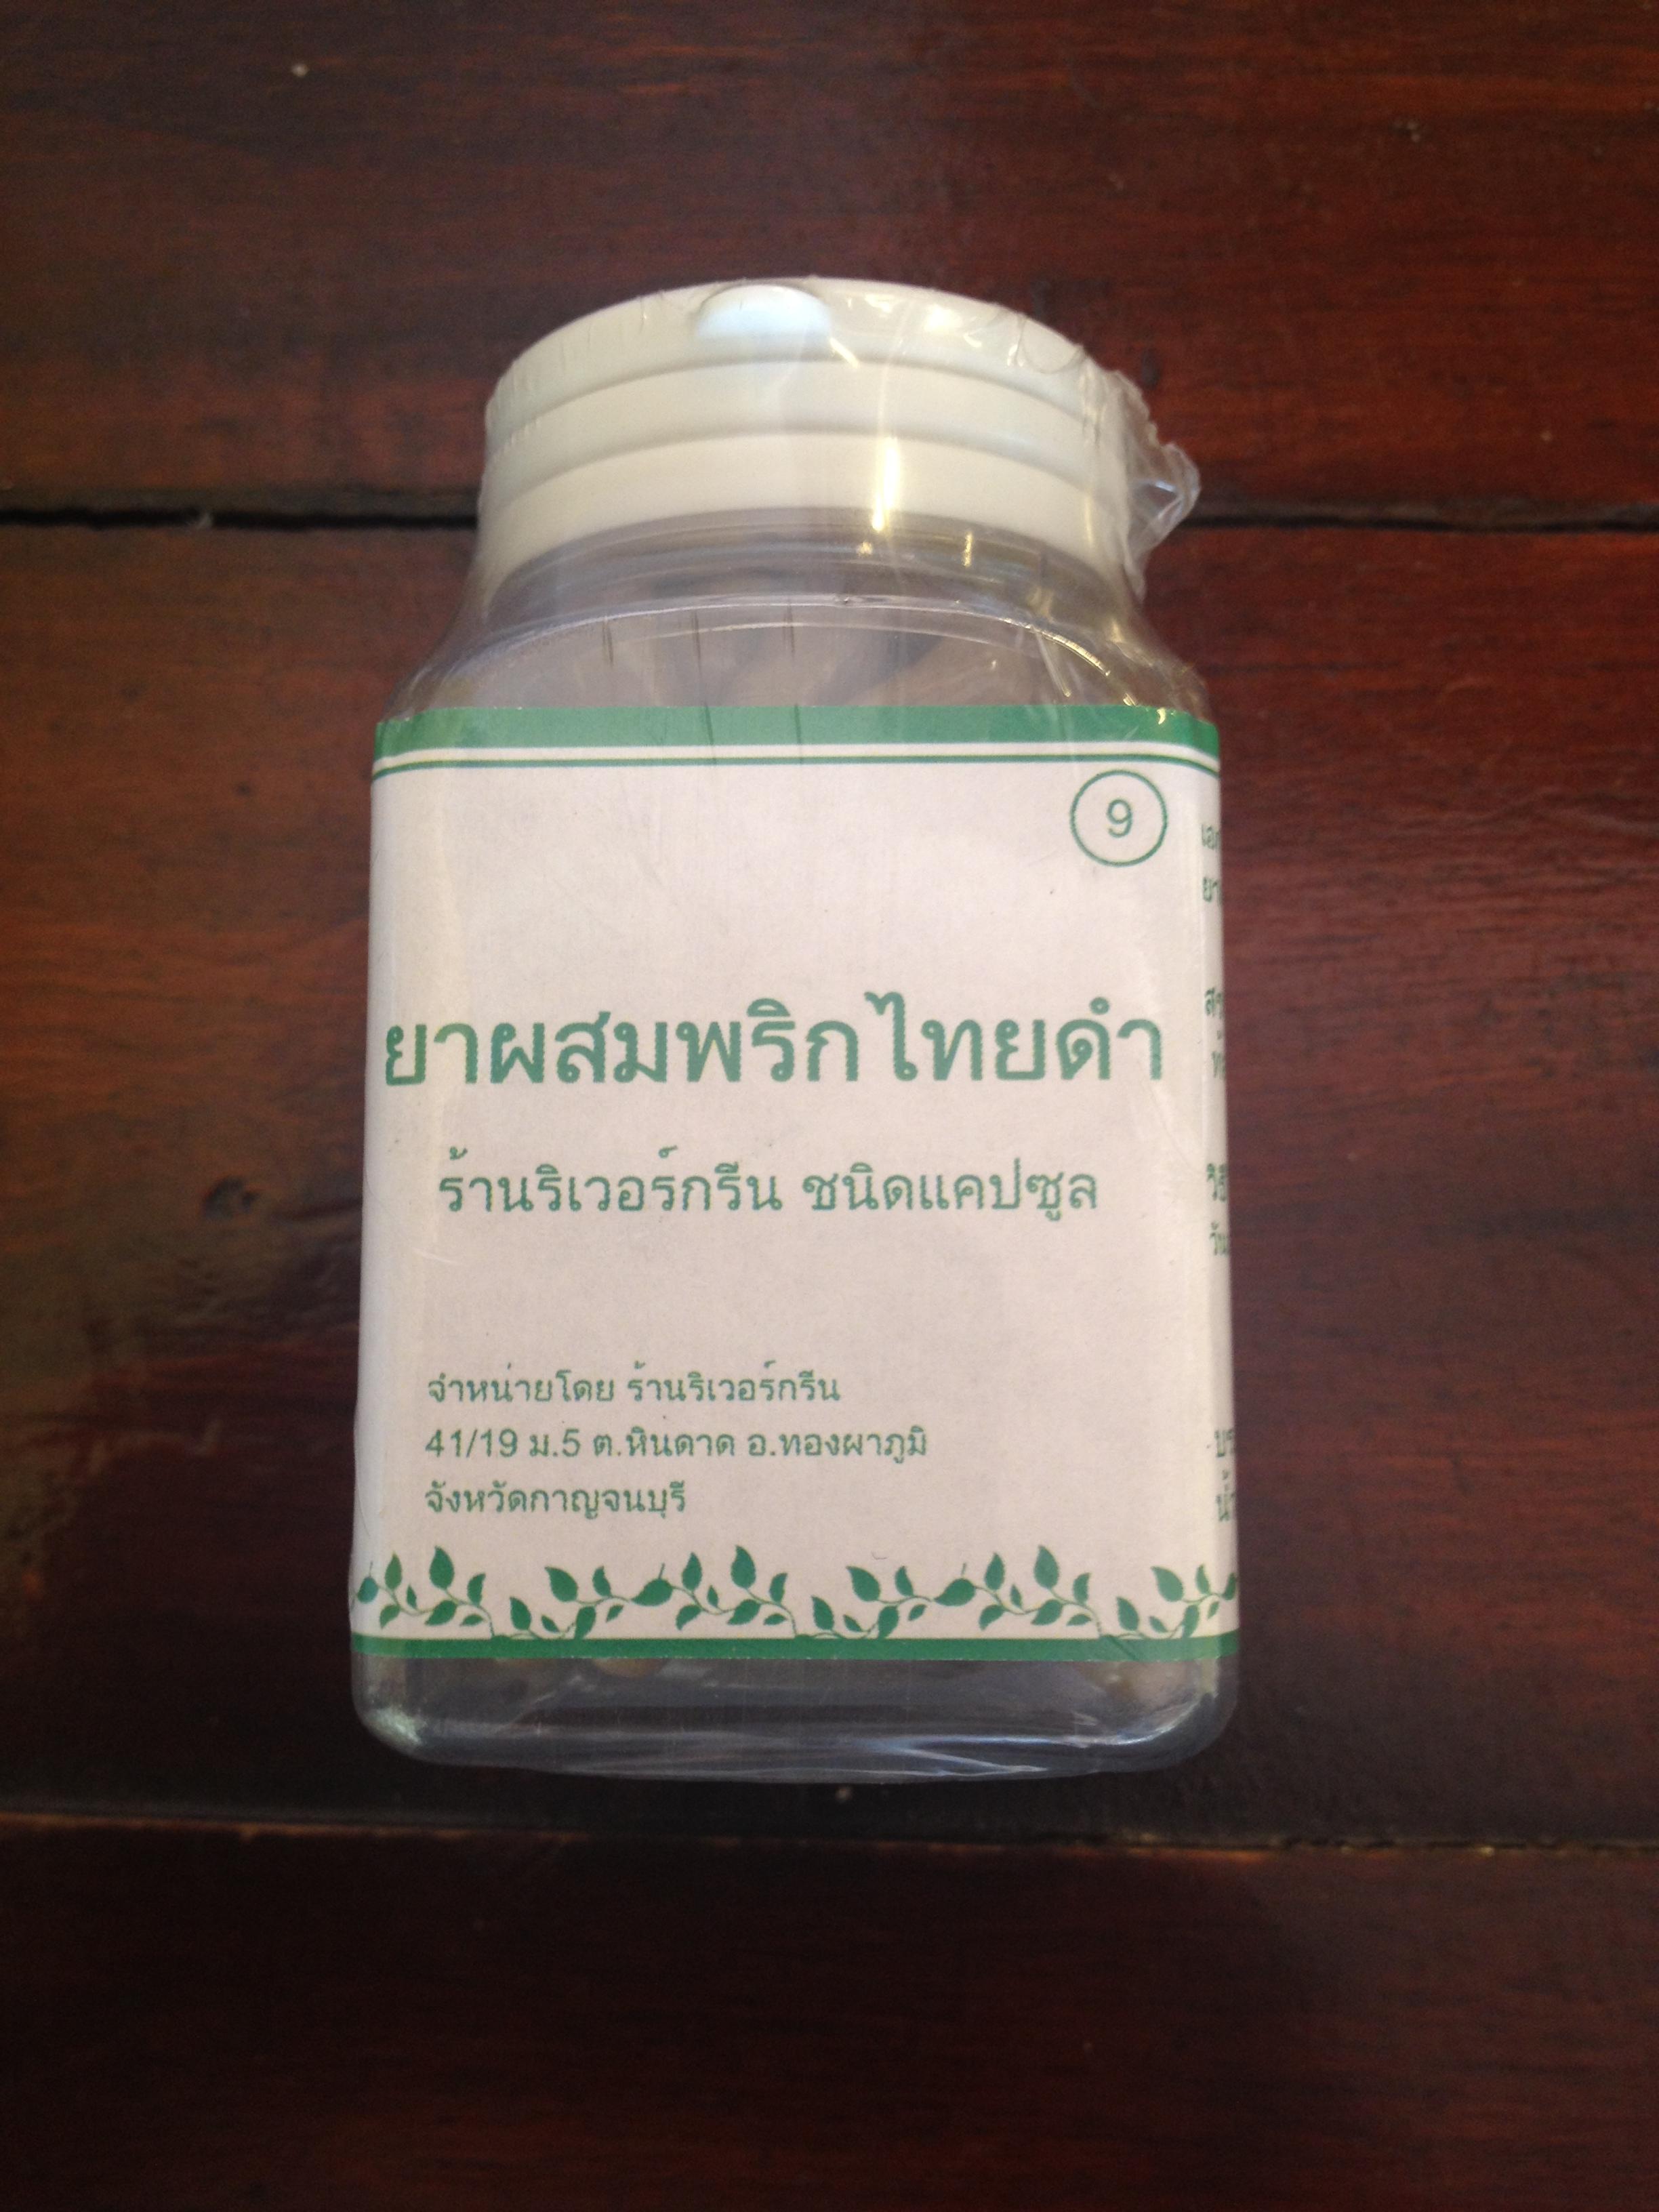 Prik Thai Dam Таблетки Для Похудения